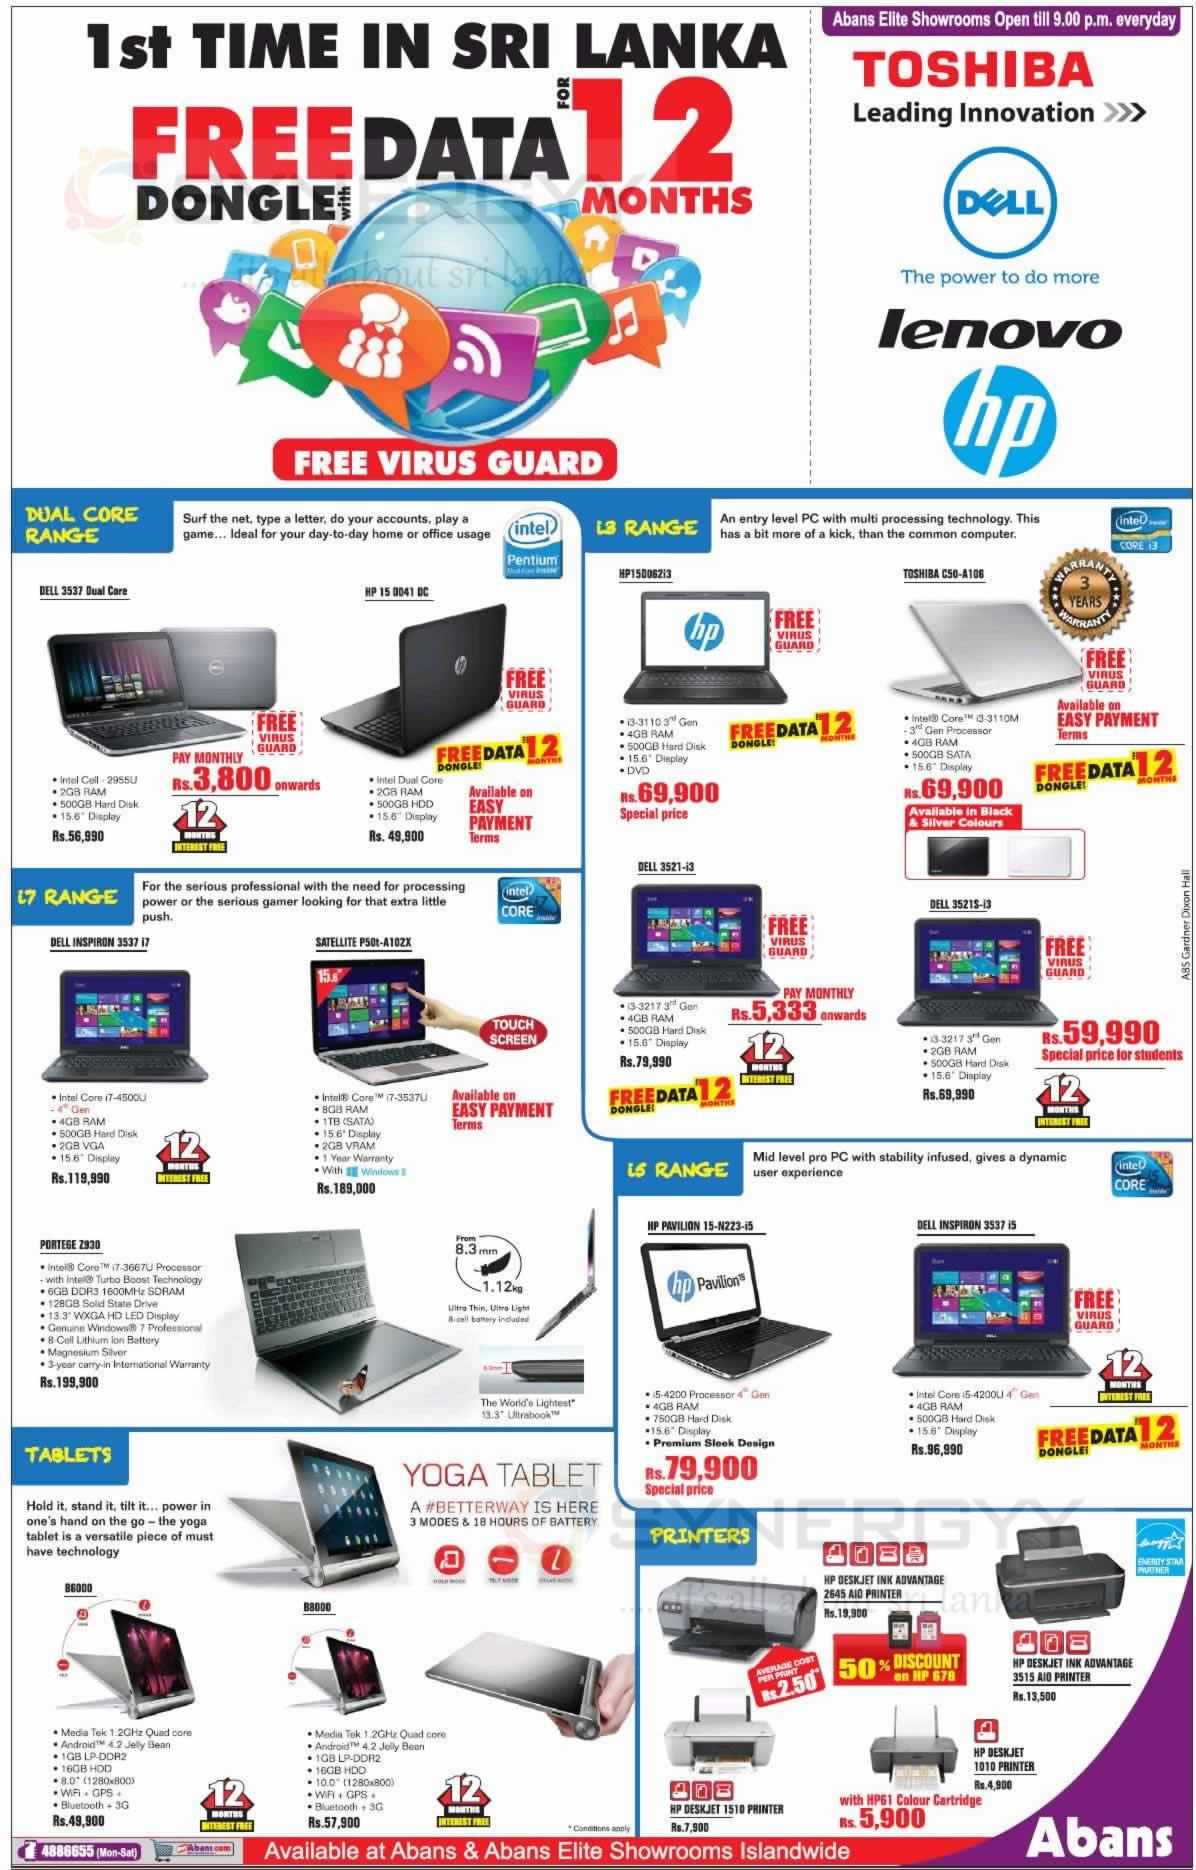 Hp Tablet In Sri Lanka Synergyy